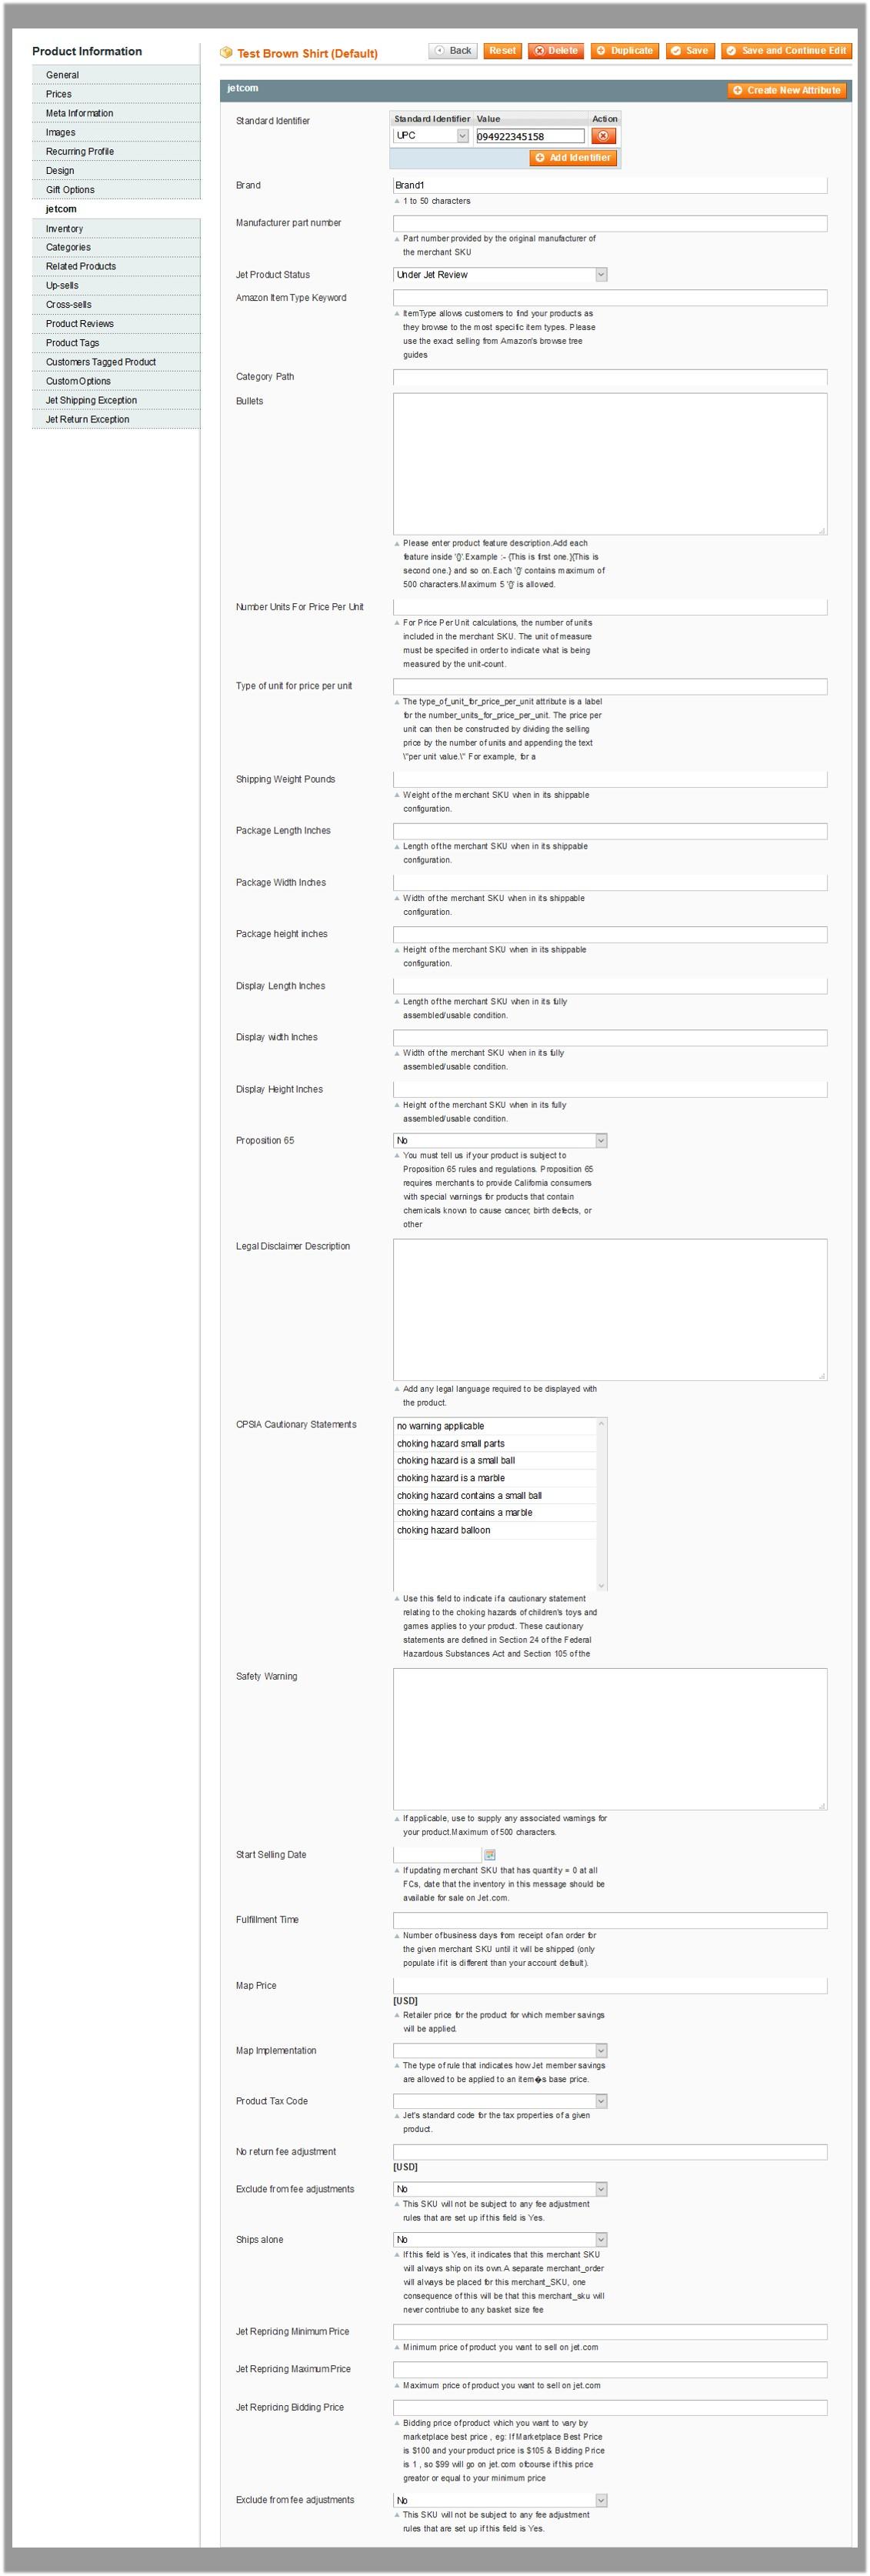 Product Information_jetcom